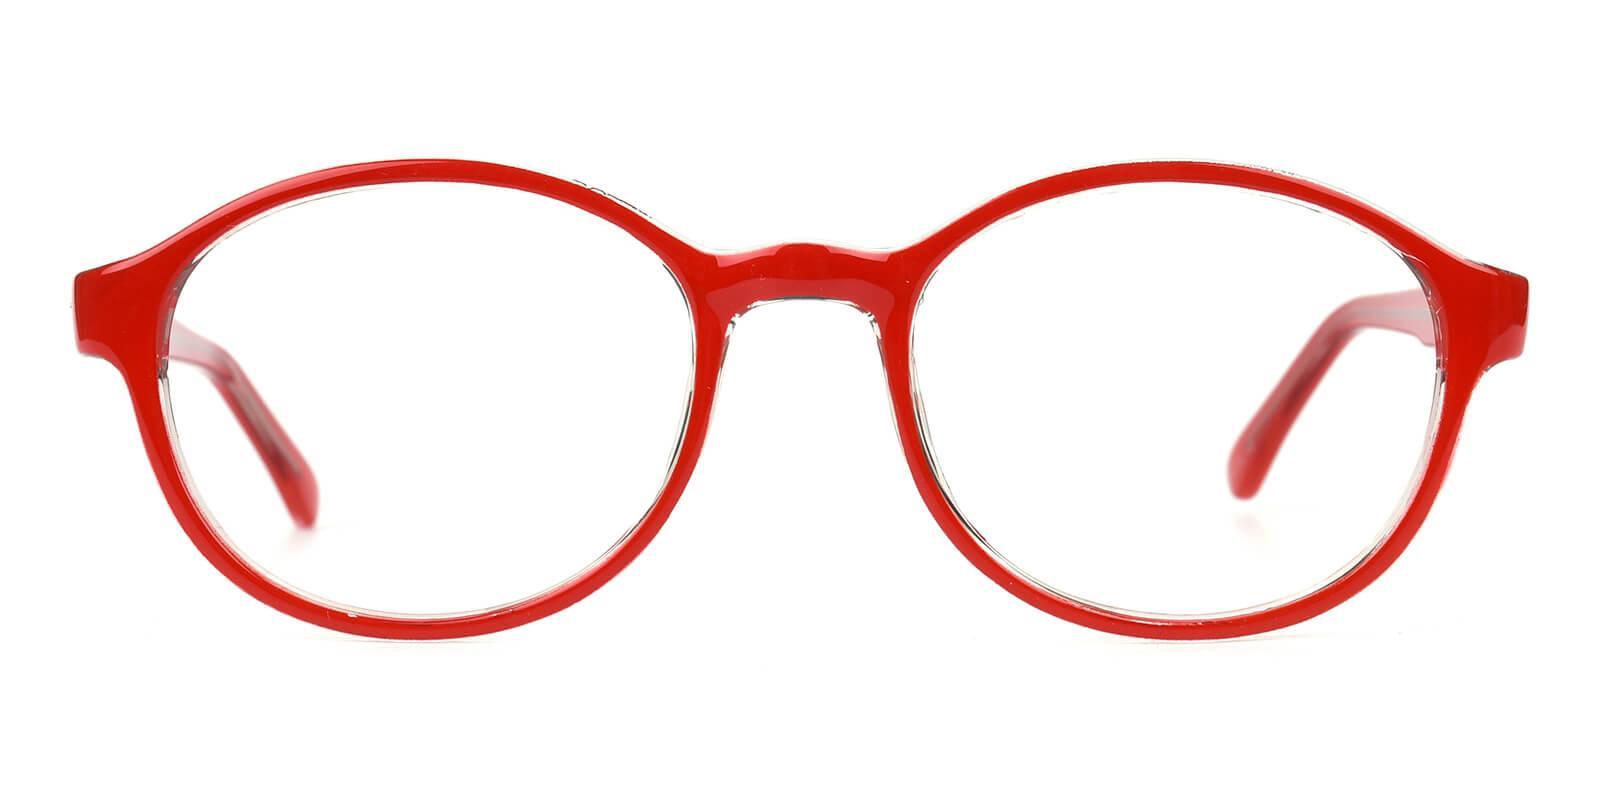 Achiever-Red-Round-Plastic-Eyeglasses-additional2